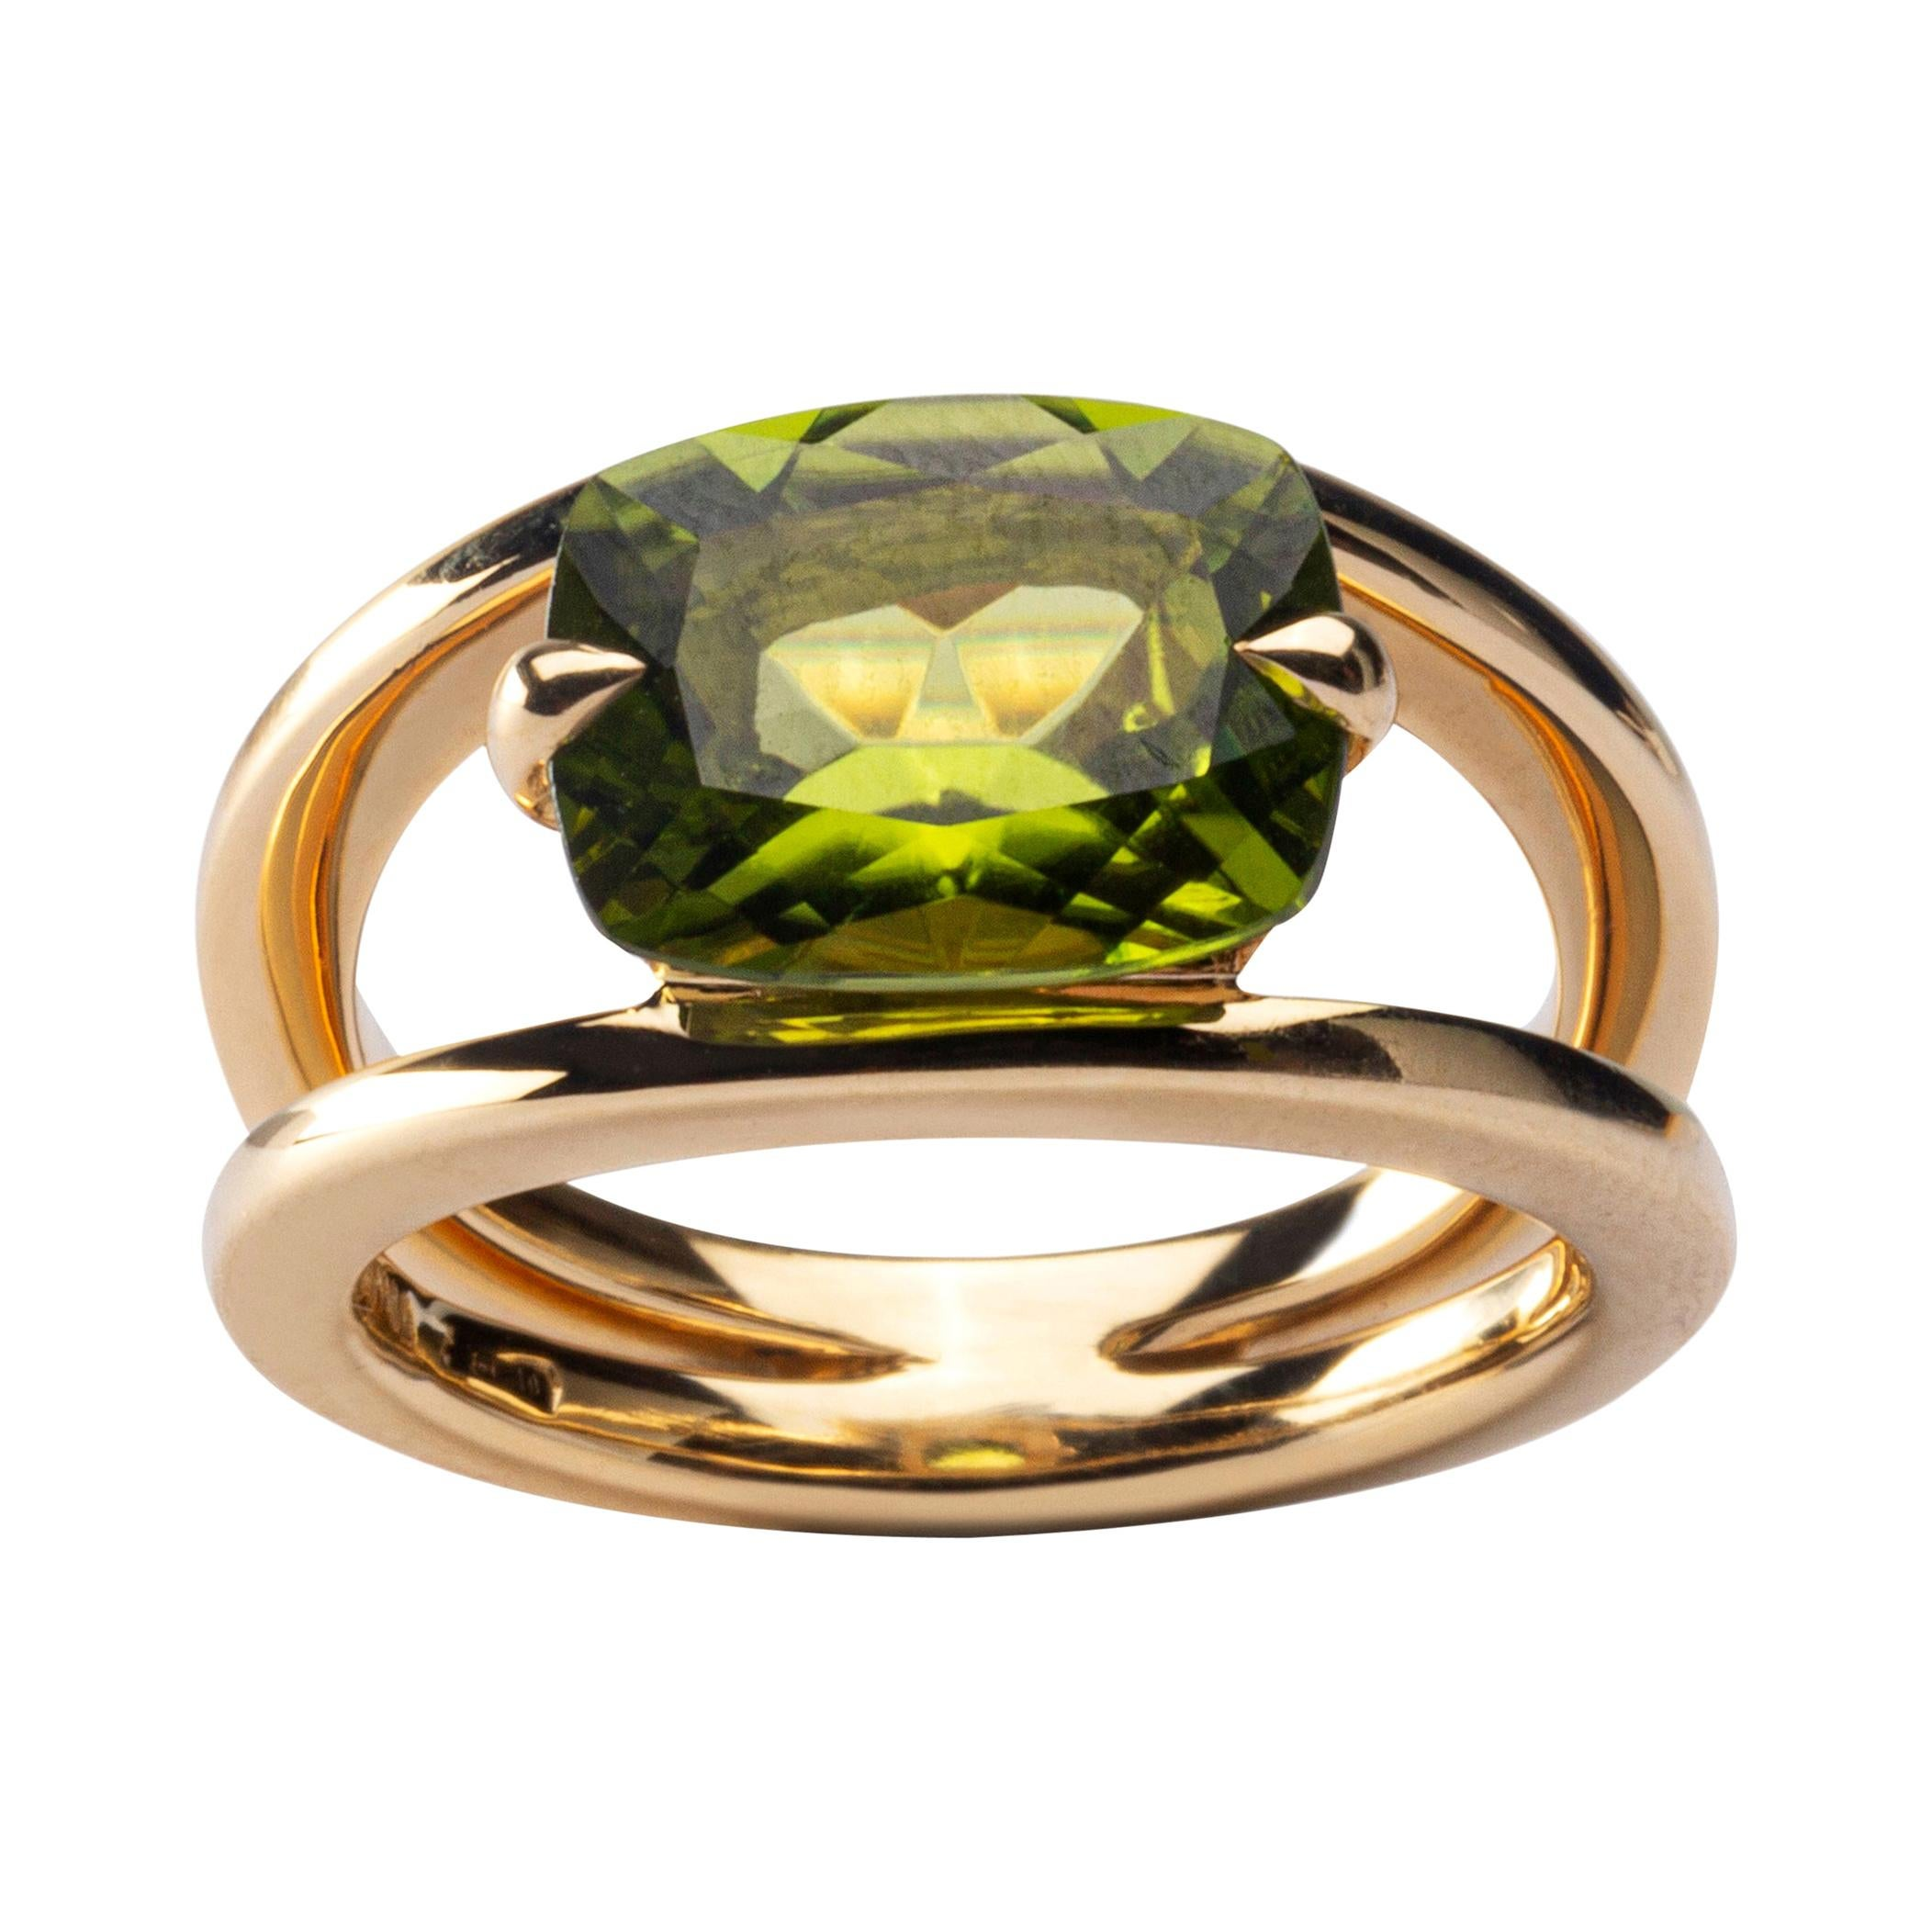 Alex Jona Peridot 18 Karat Yellow Gold Solitaire Ring